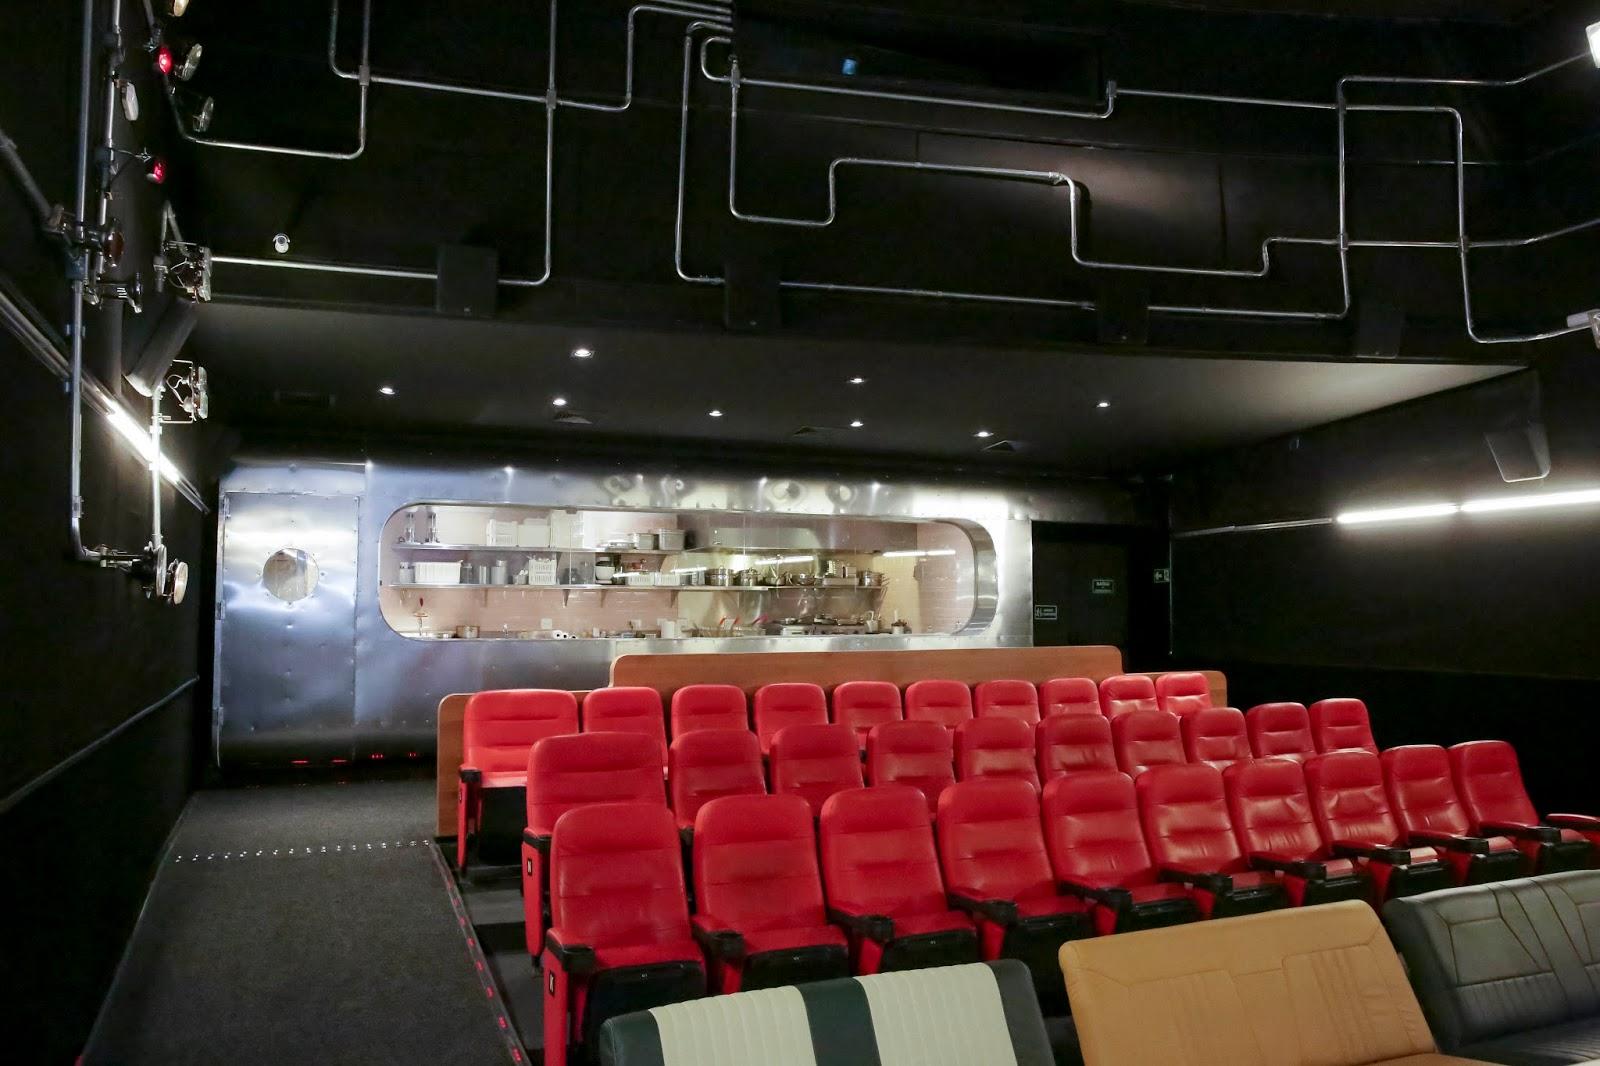 Salas De Cinema De S O Paulo Caixa Belas Artes Sala Drive In S O  -> Imagem De Sala De Cinema